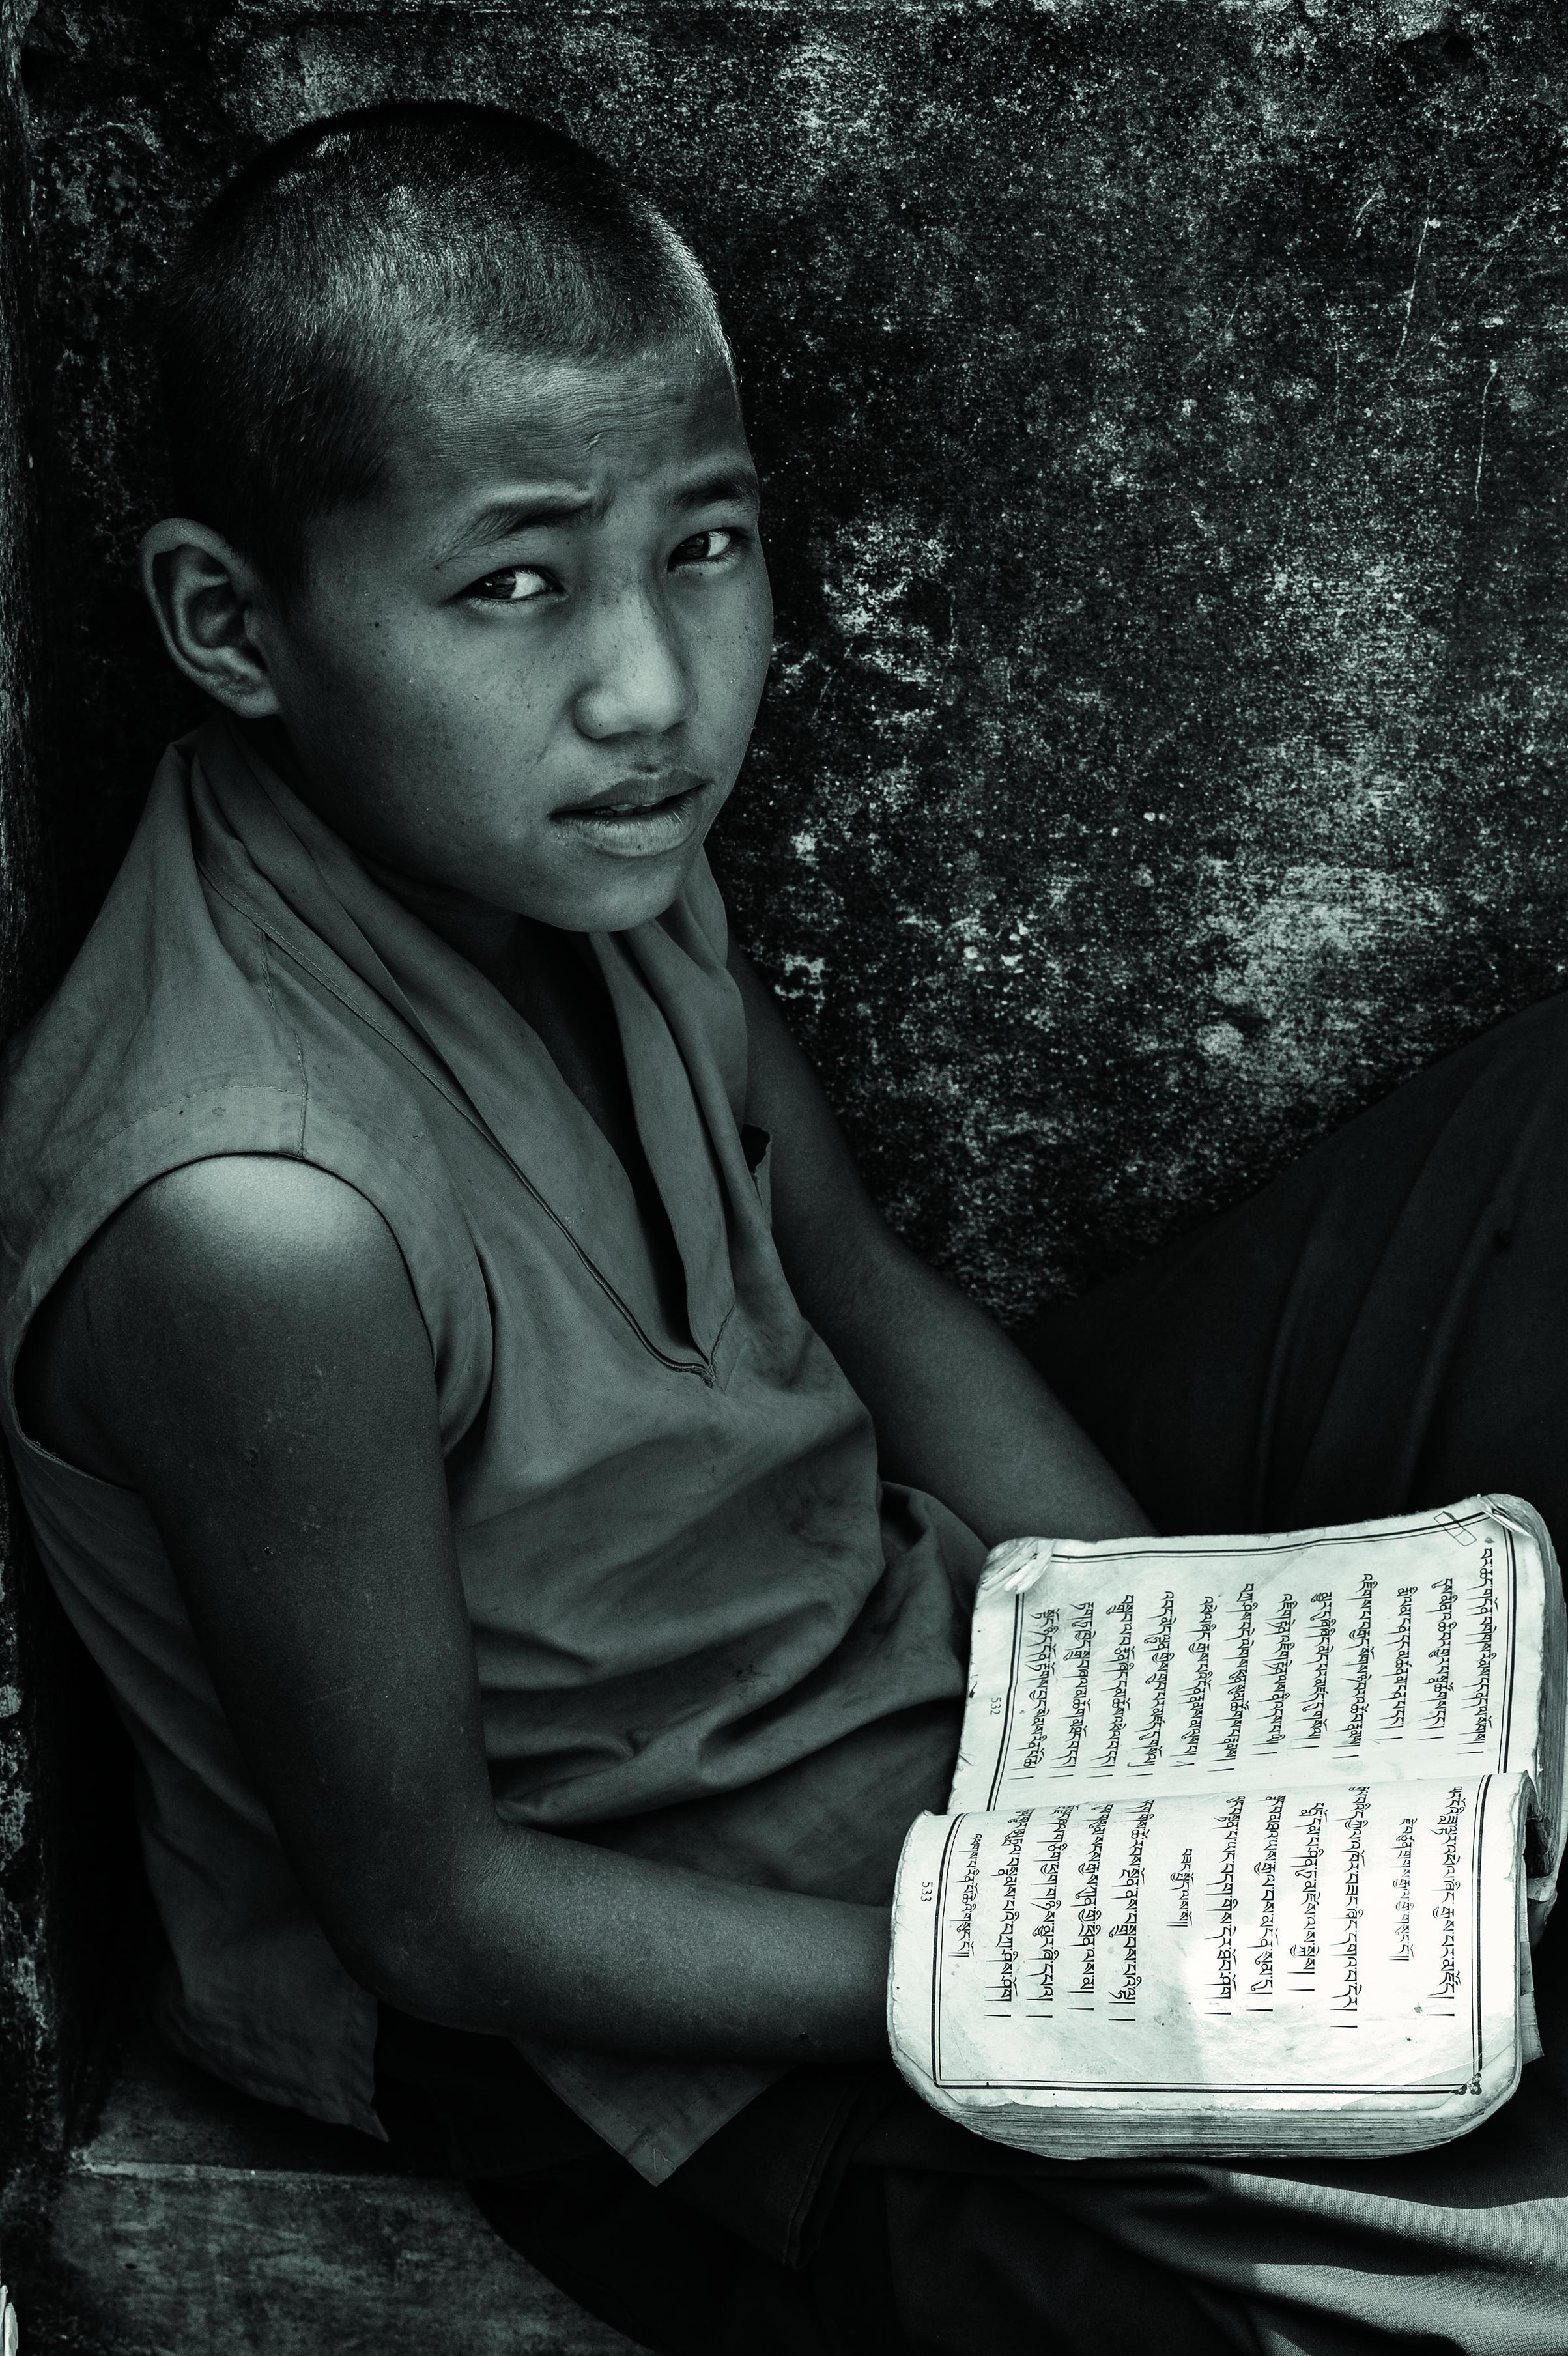 Novice et le livre sacre╠ü be╠ürokyentse╠ü Ne╠üpal 2013 Isabelle Garcia-Chopin ┬®-2